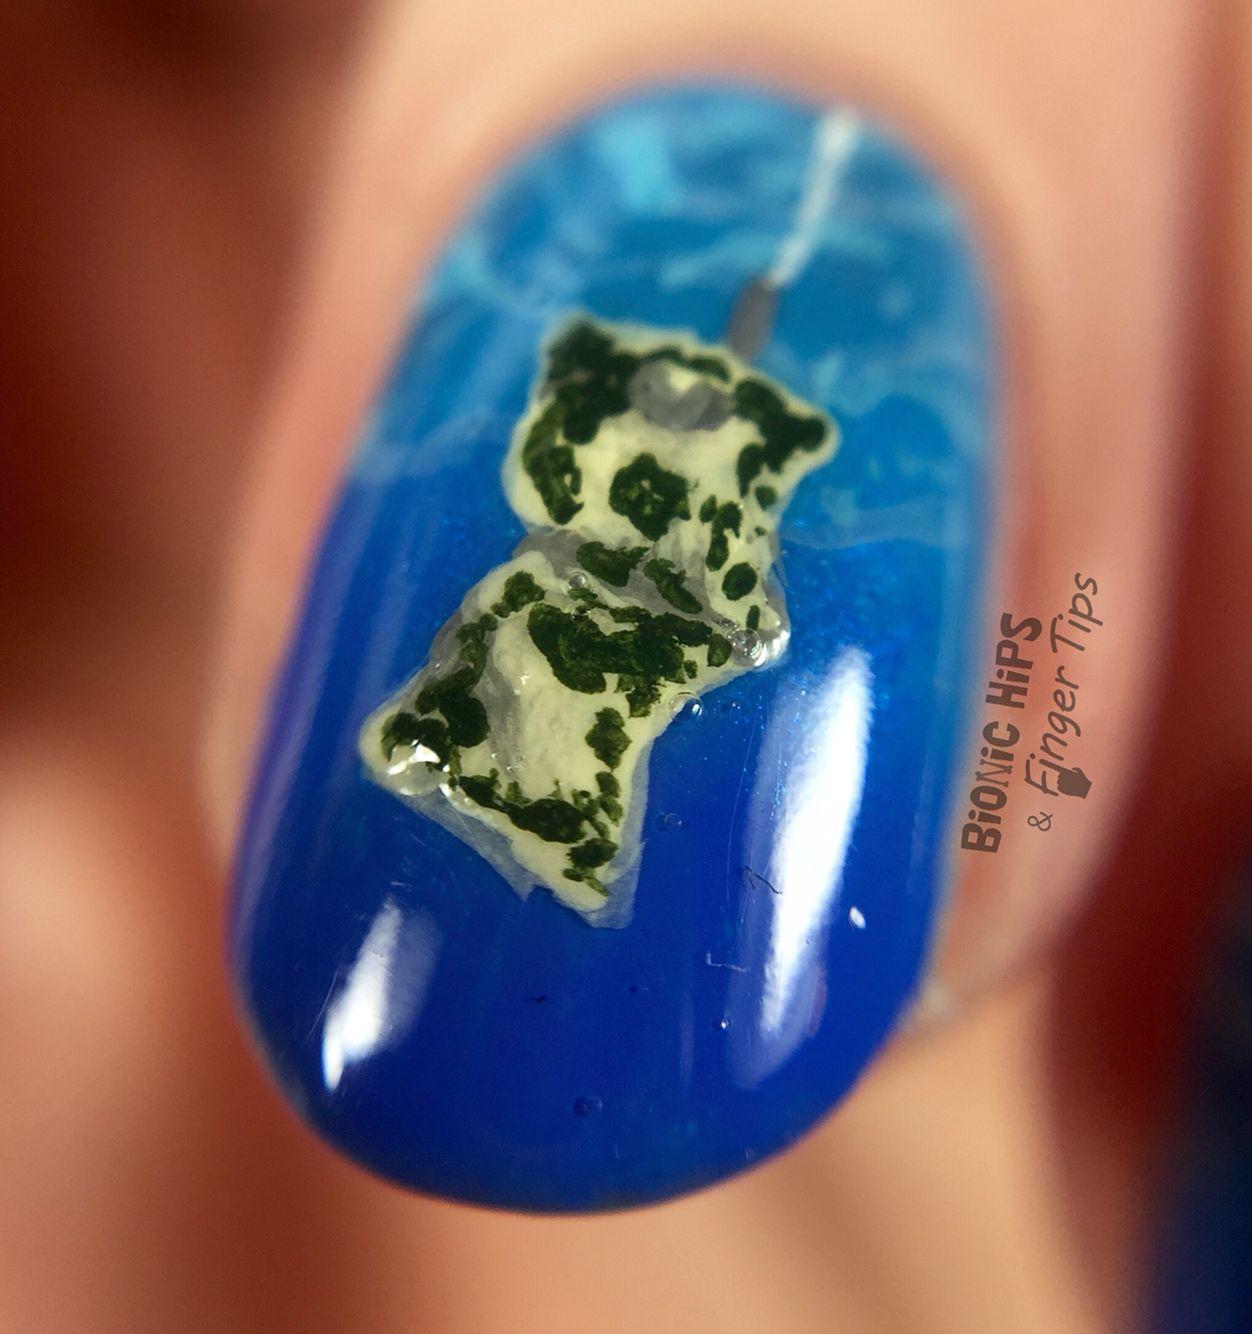 Nirvana nail art by Bionic Hips and Finger Tips | My nail art ...